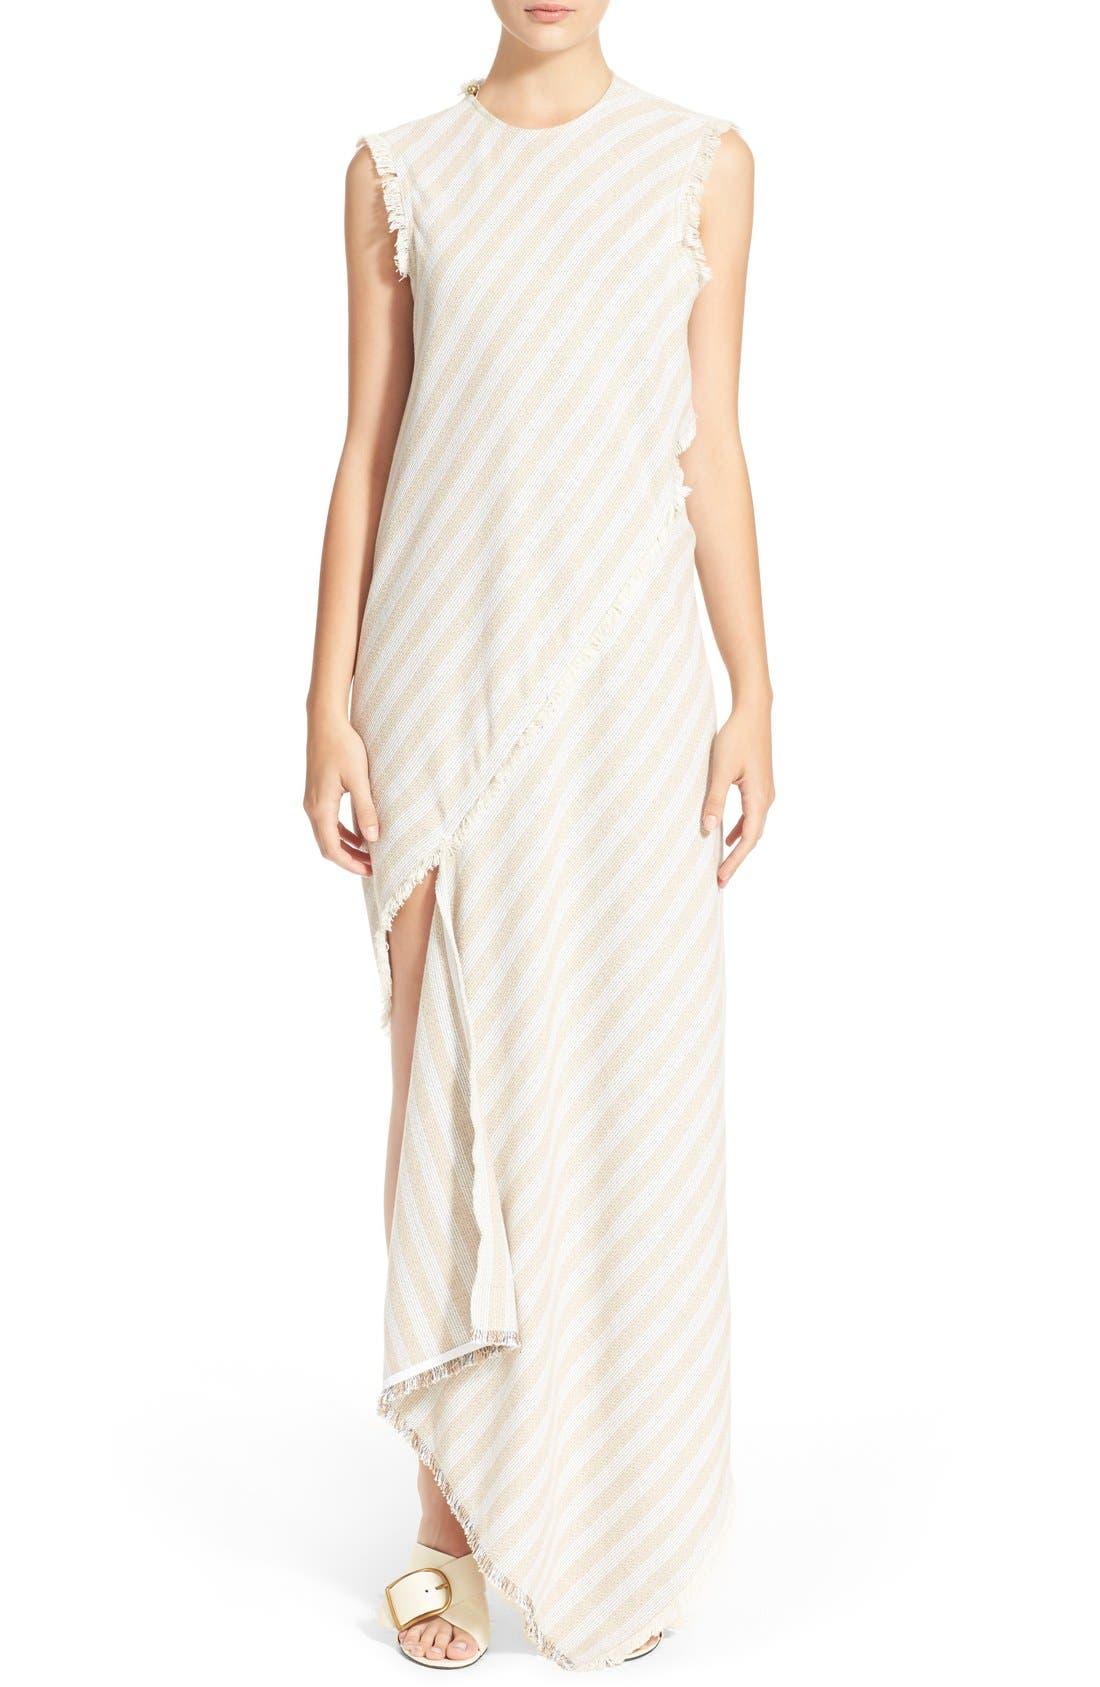 'Cosby' Stripe Sleeveless Dress,                             Alternate thumbnail 7, color,                             Natural Stripe